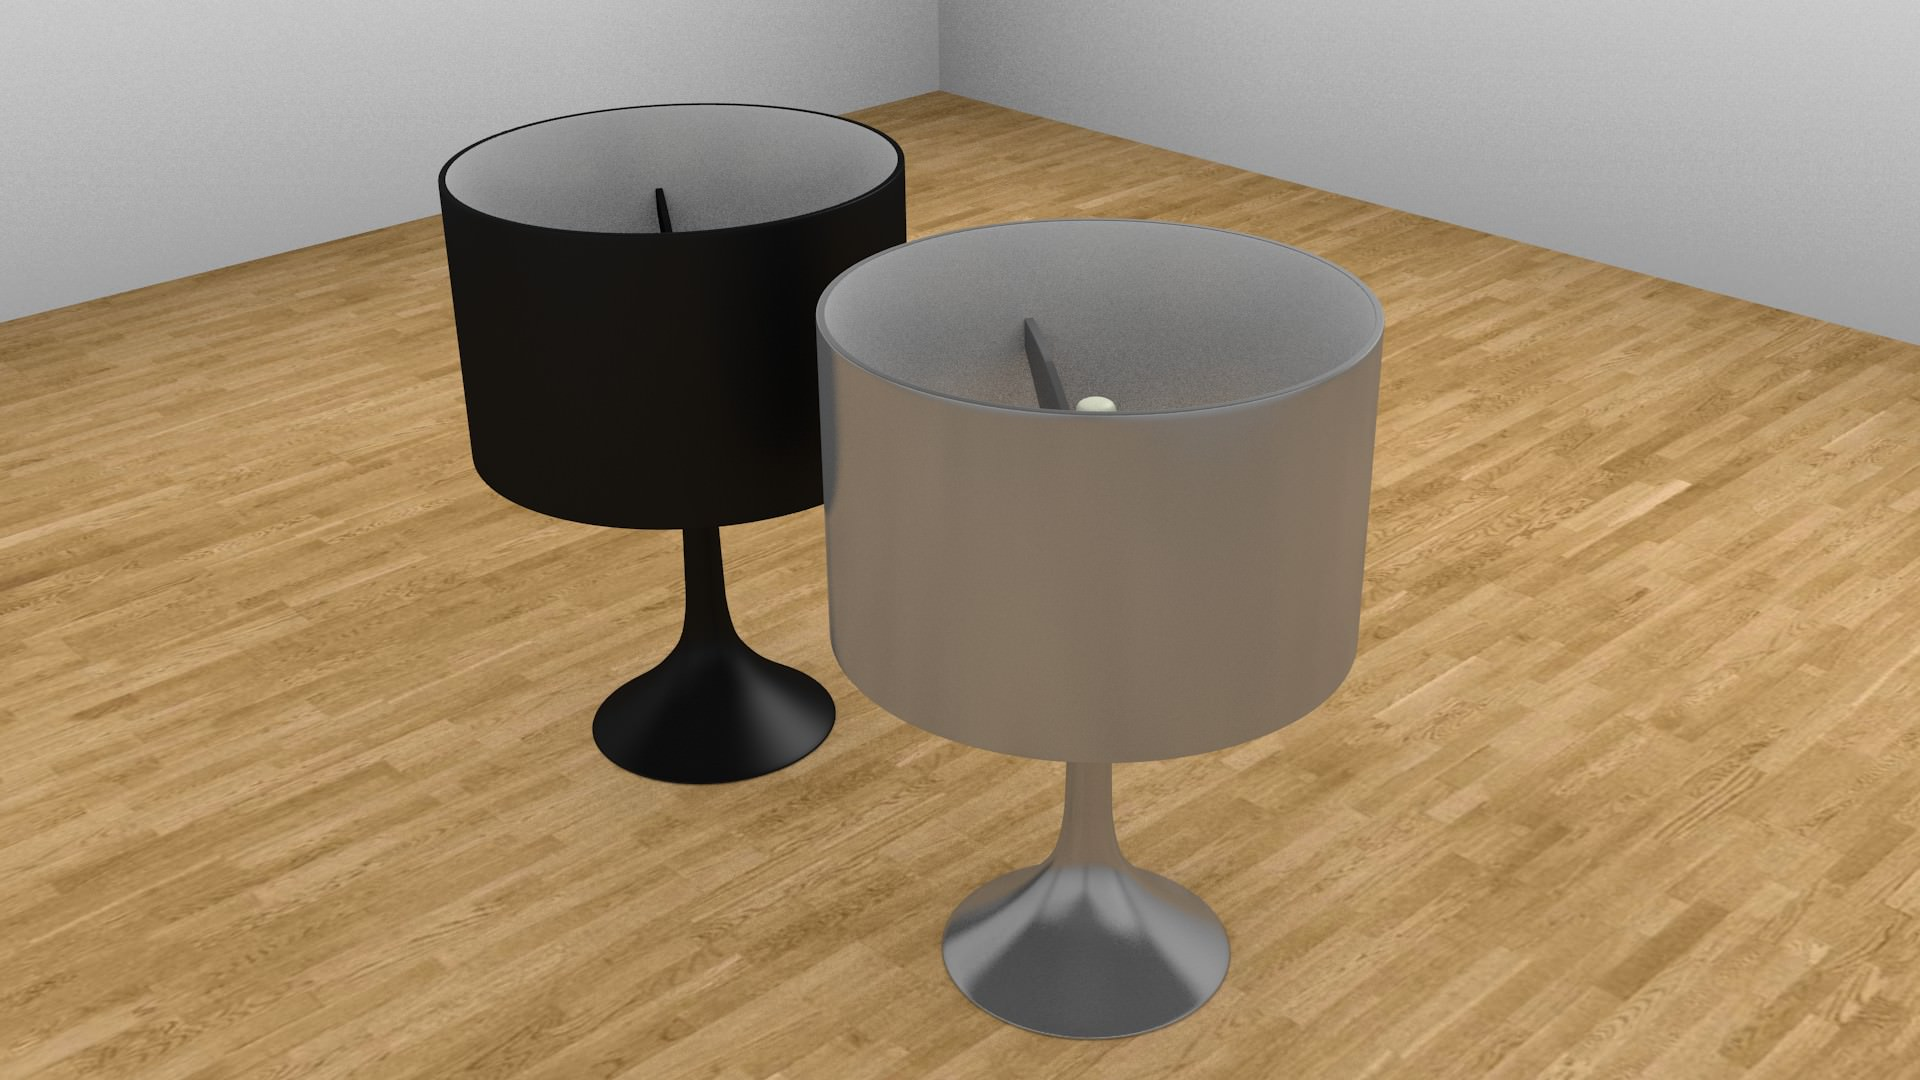 3D Flos Spun Lamp | CGTrader For Flos Spun Table Lamp 173lyp